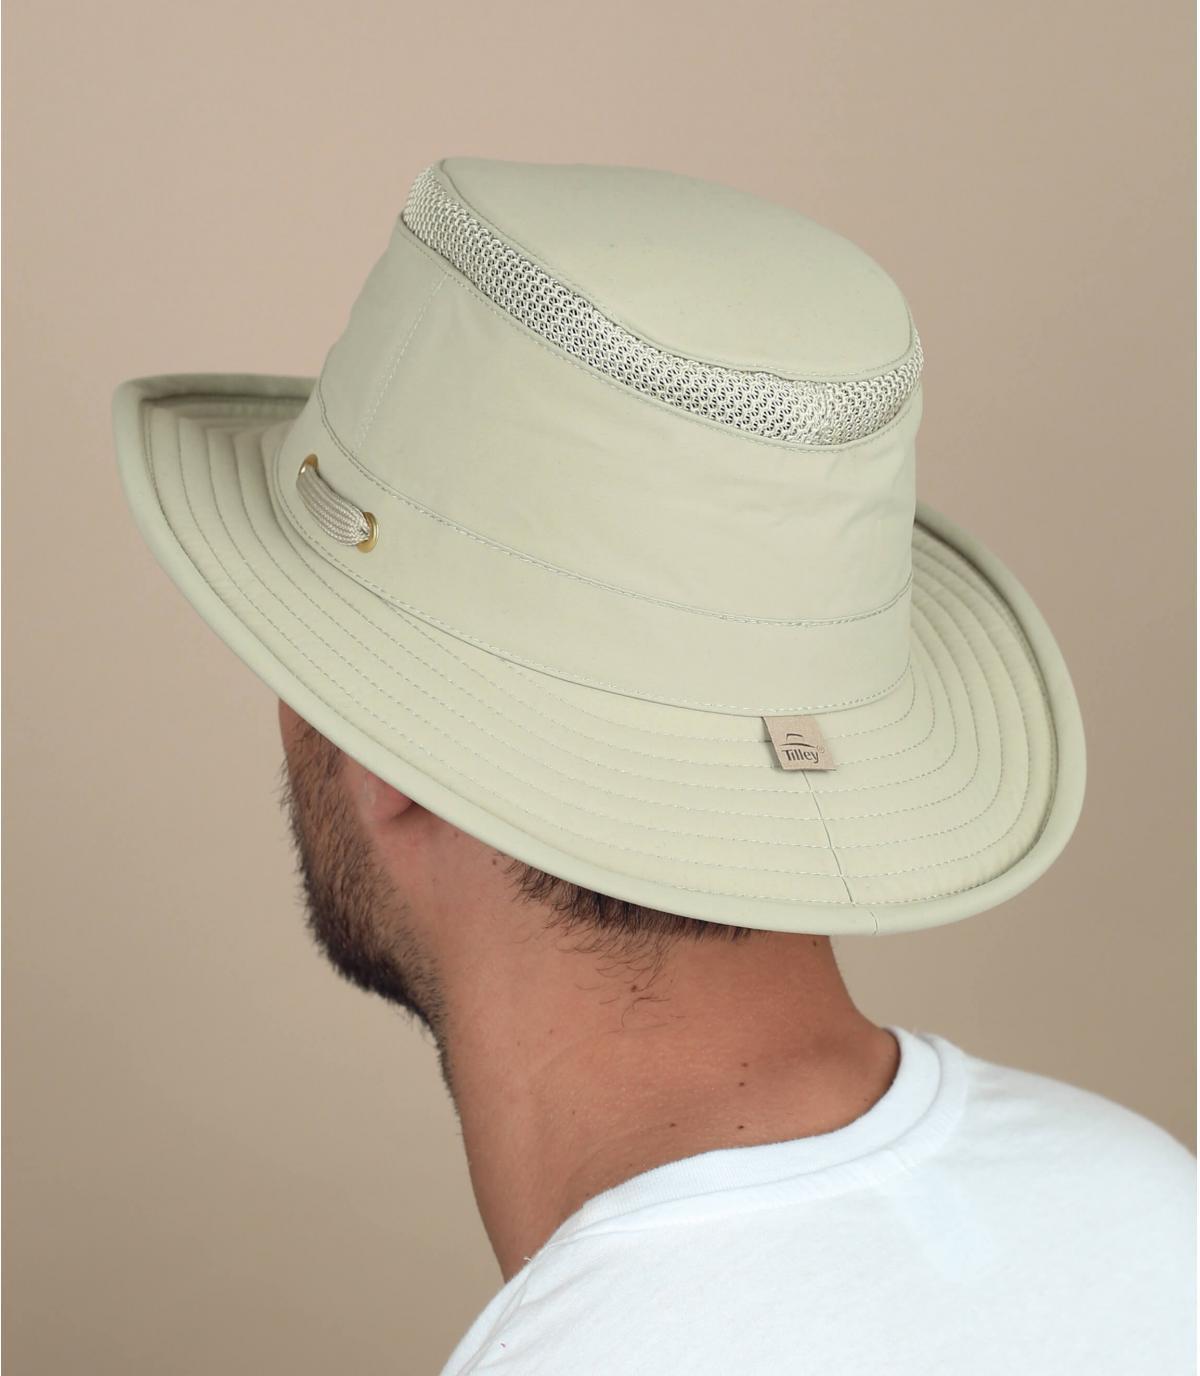 cappello traspirante LTM5 Tilley